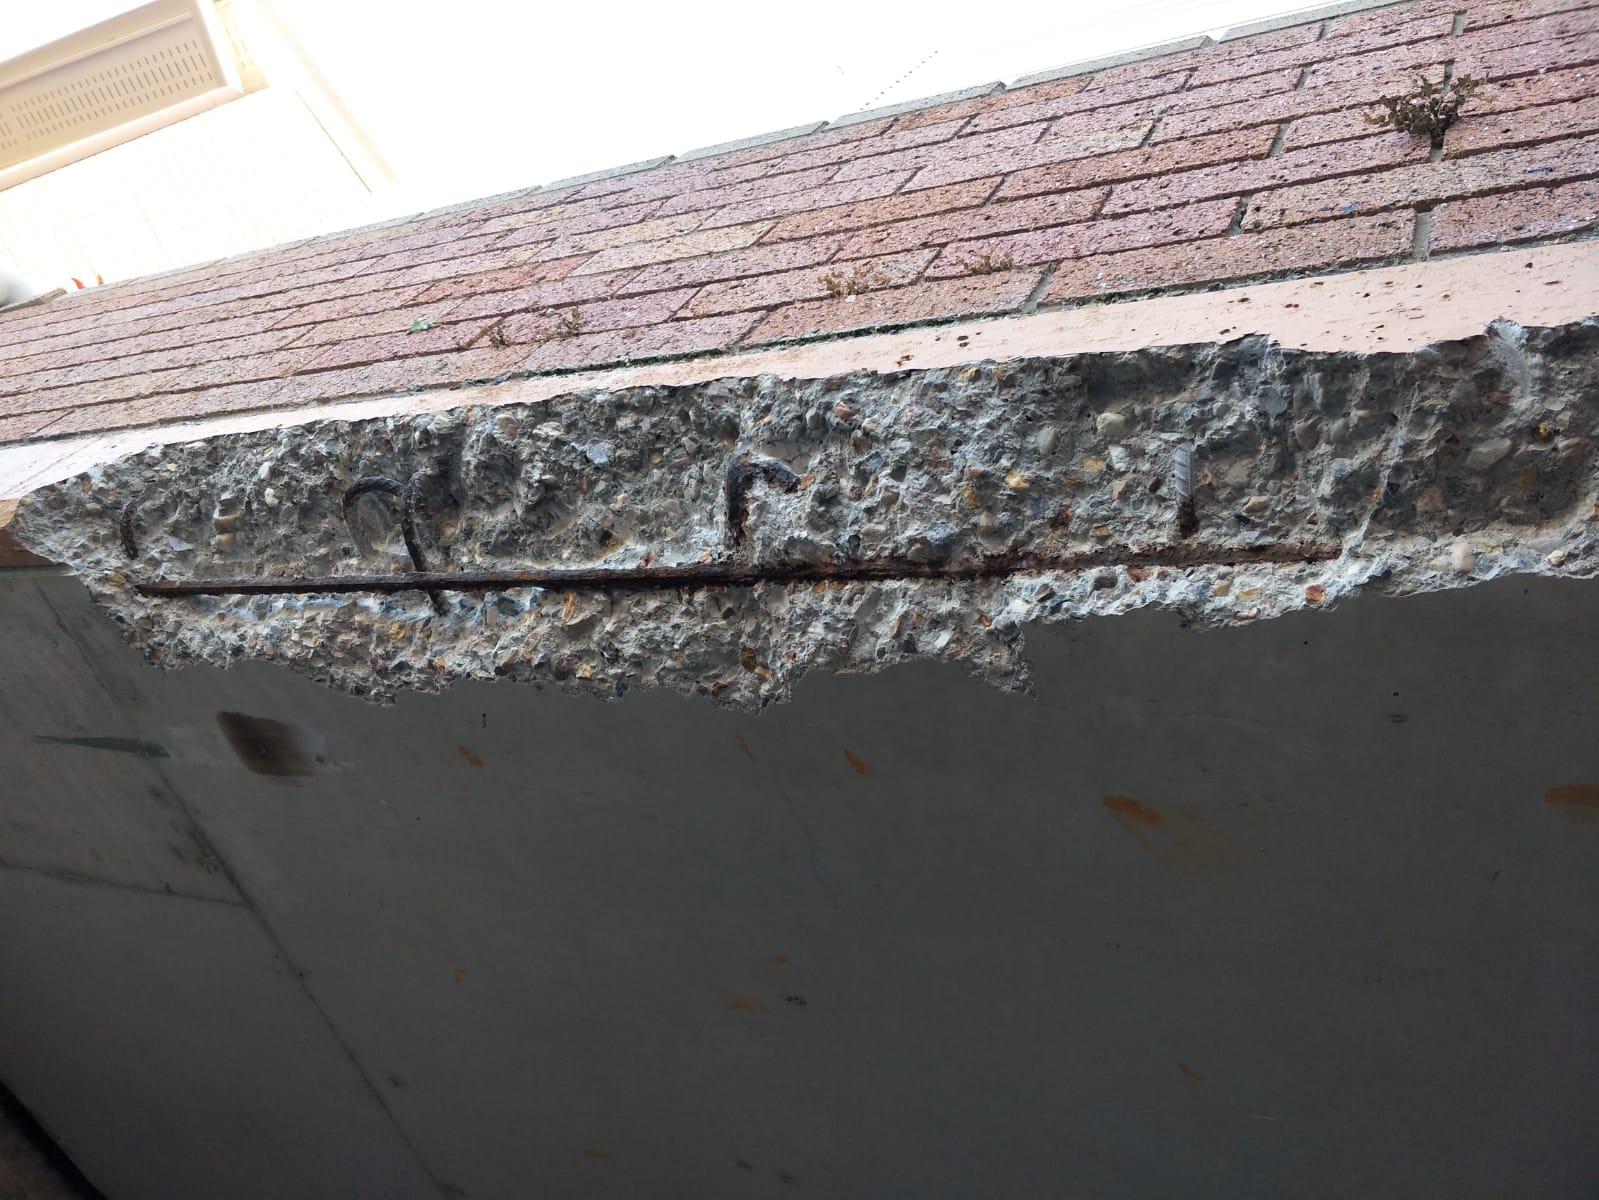 Concrete Cancer on a building